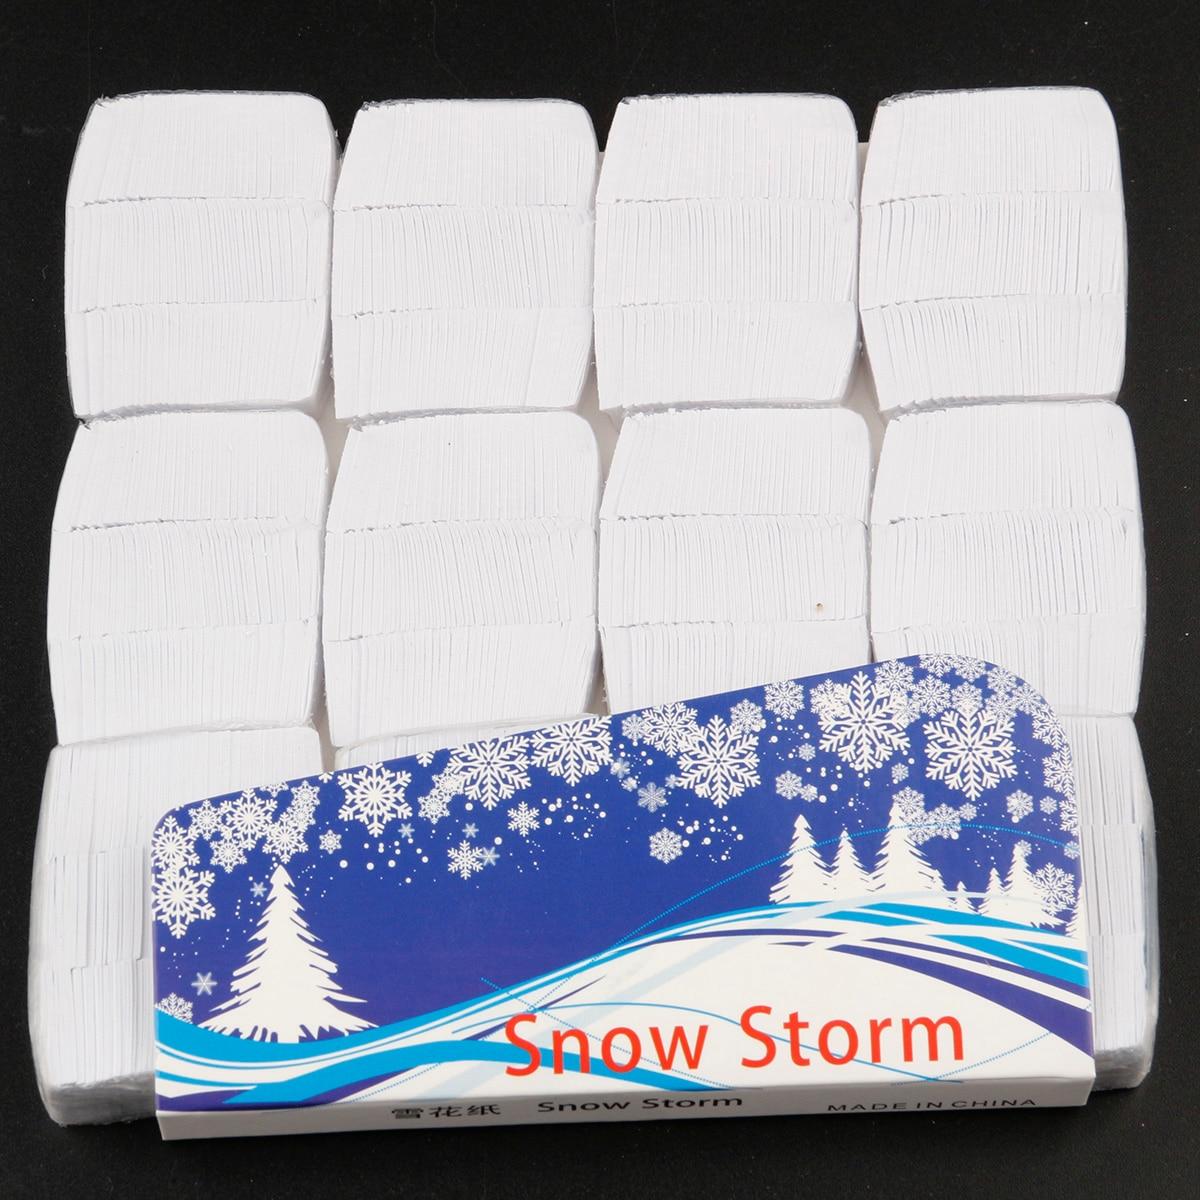 Snow Storm Magic Trick Toy 12pcs Bag White Finger Snow Paper Snowflakes Props Toys White SnowStorm Magician For Children Adult